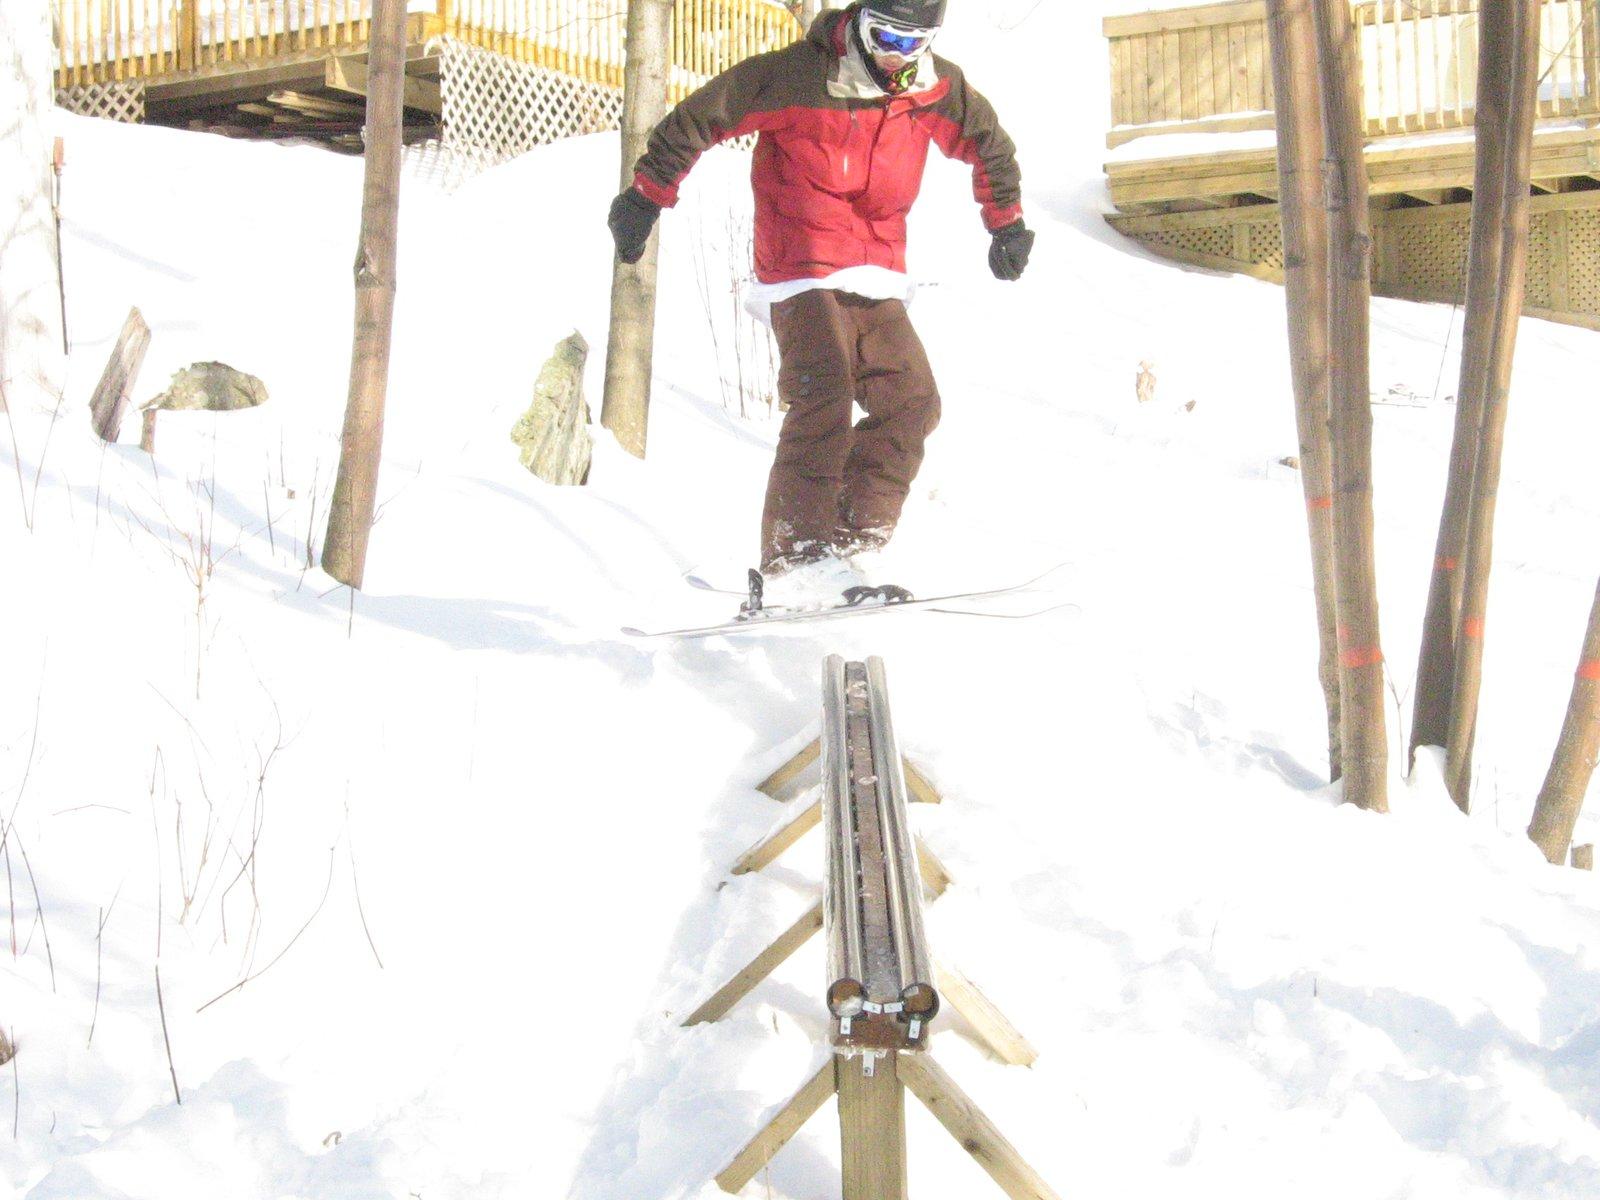 Last year on my rail